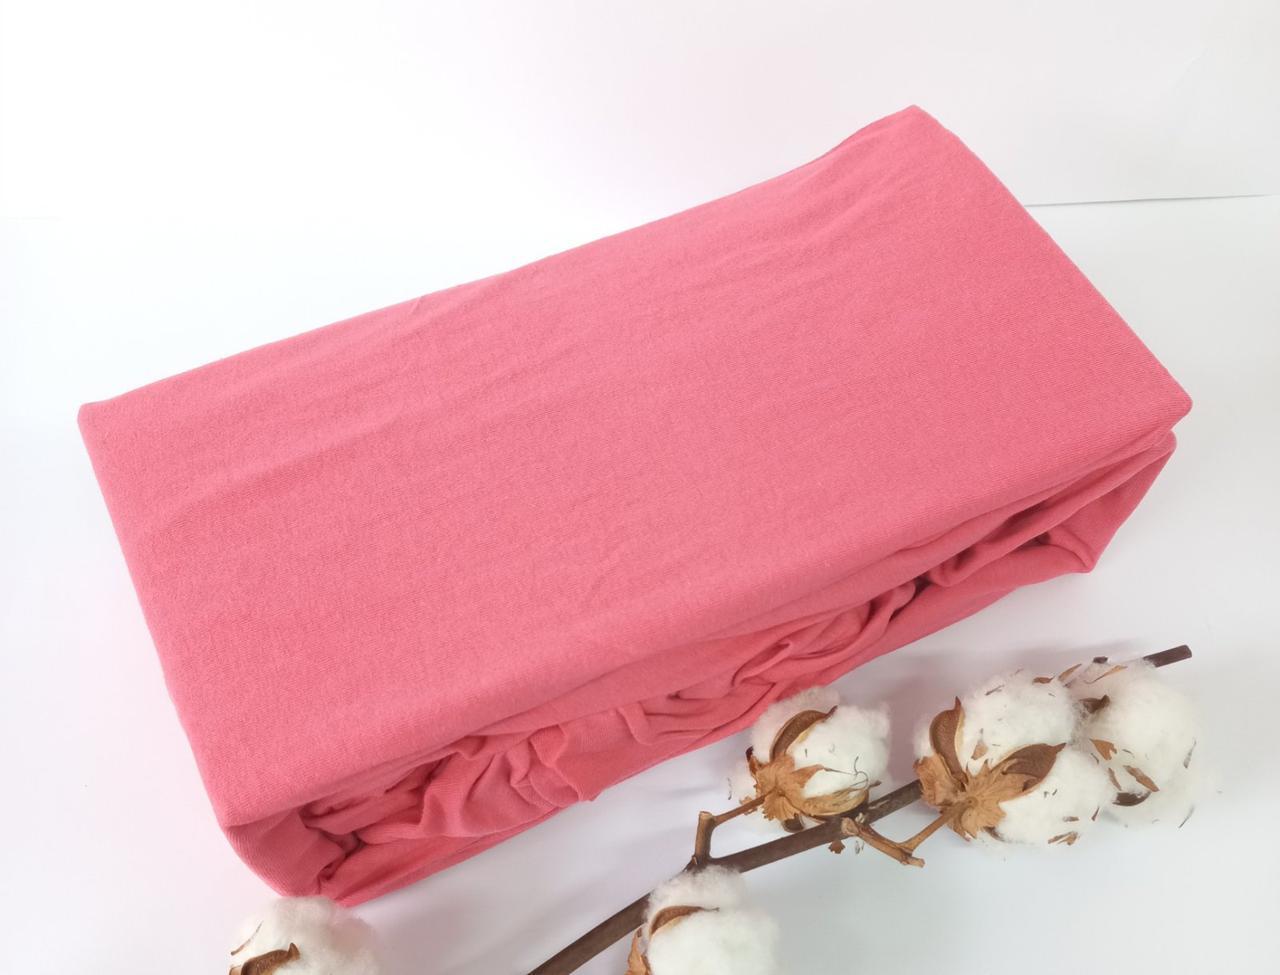 Простинь на резинке АЕ 160x200 Розовая